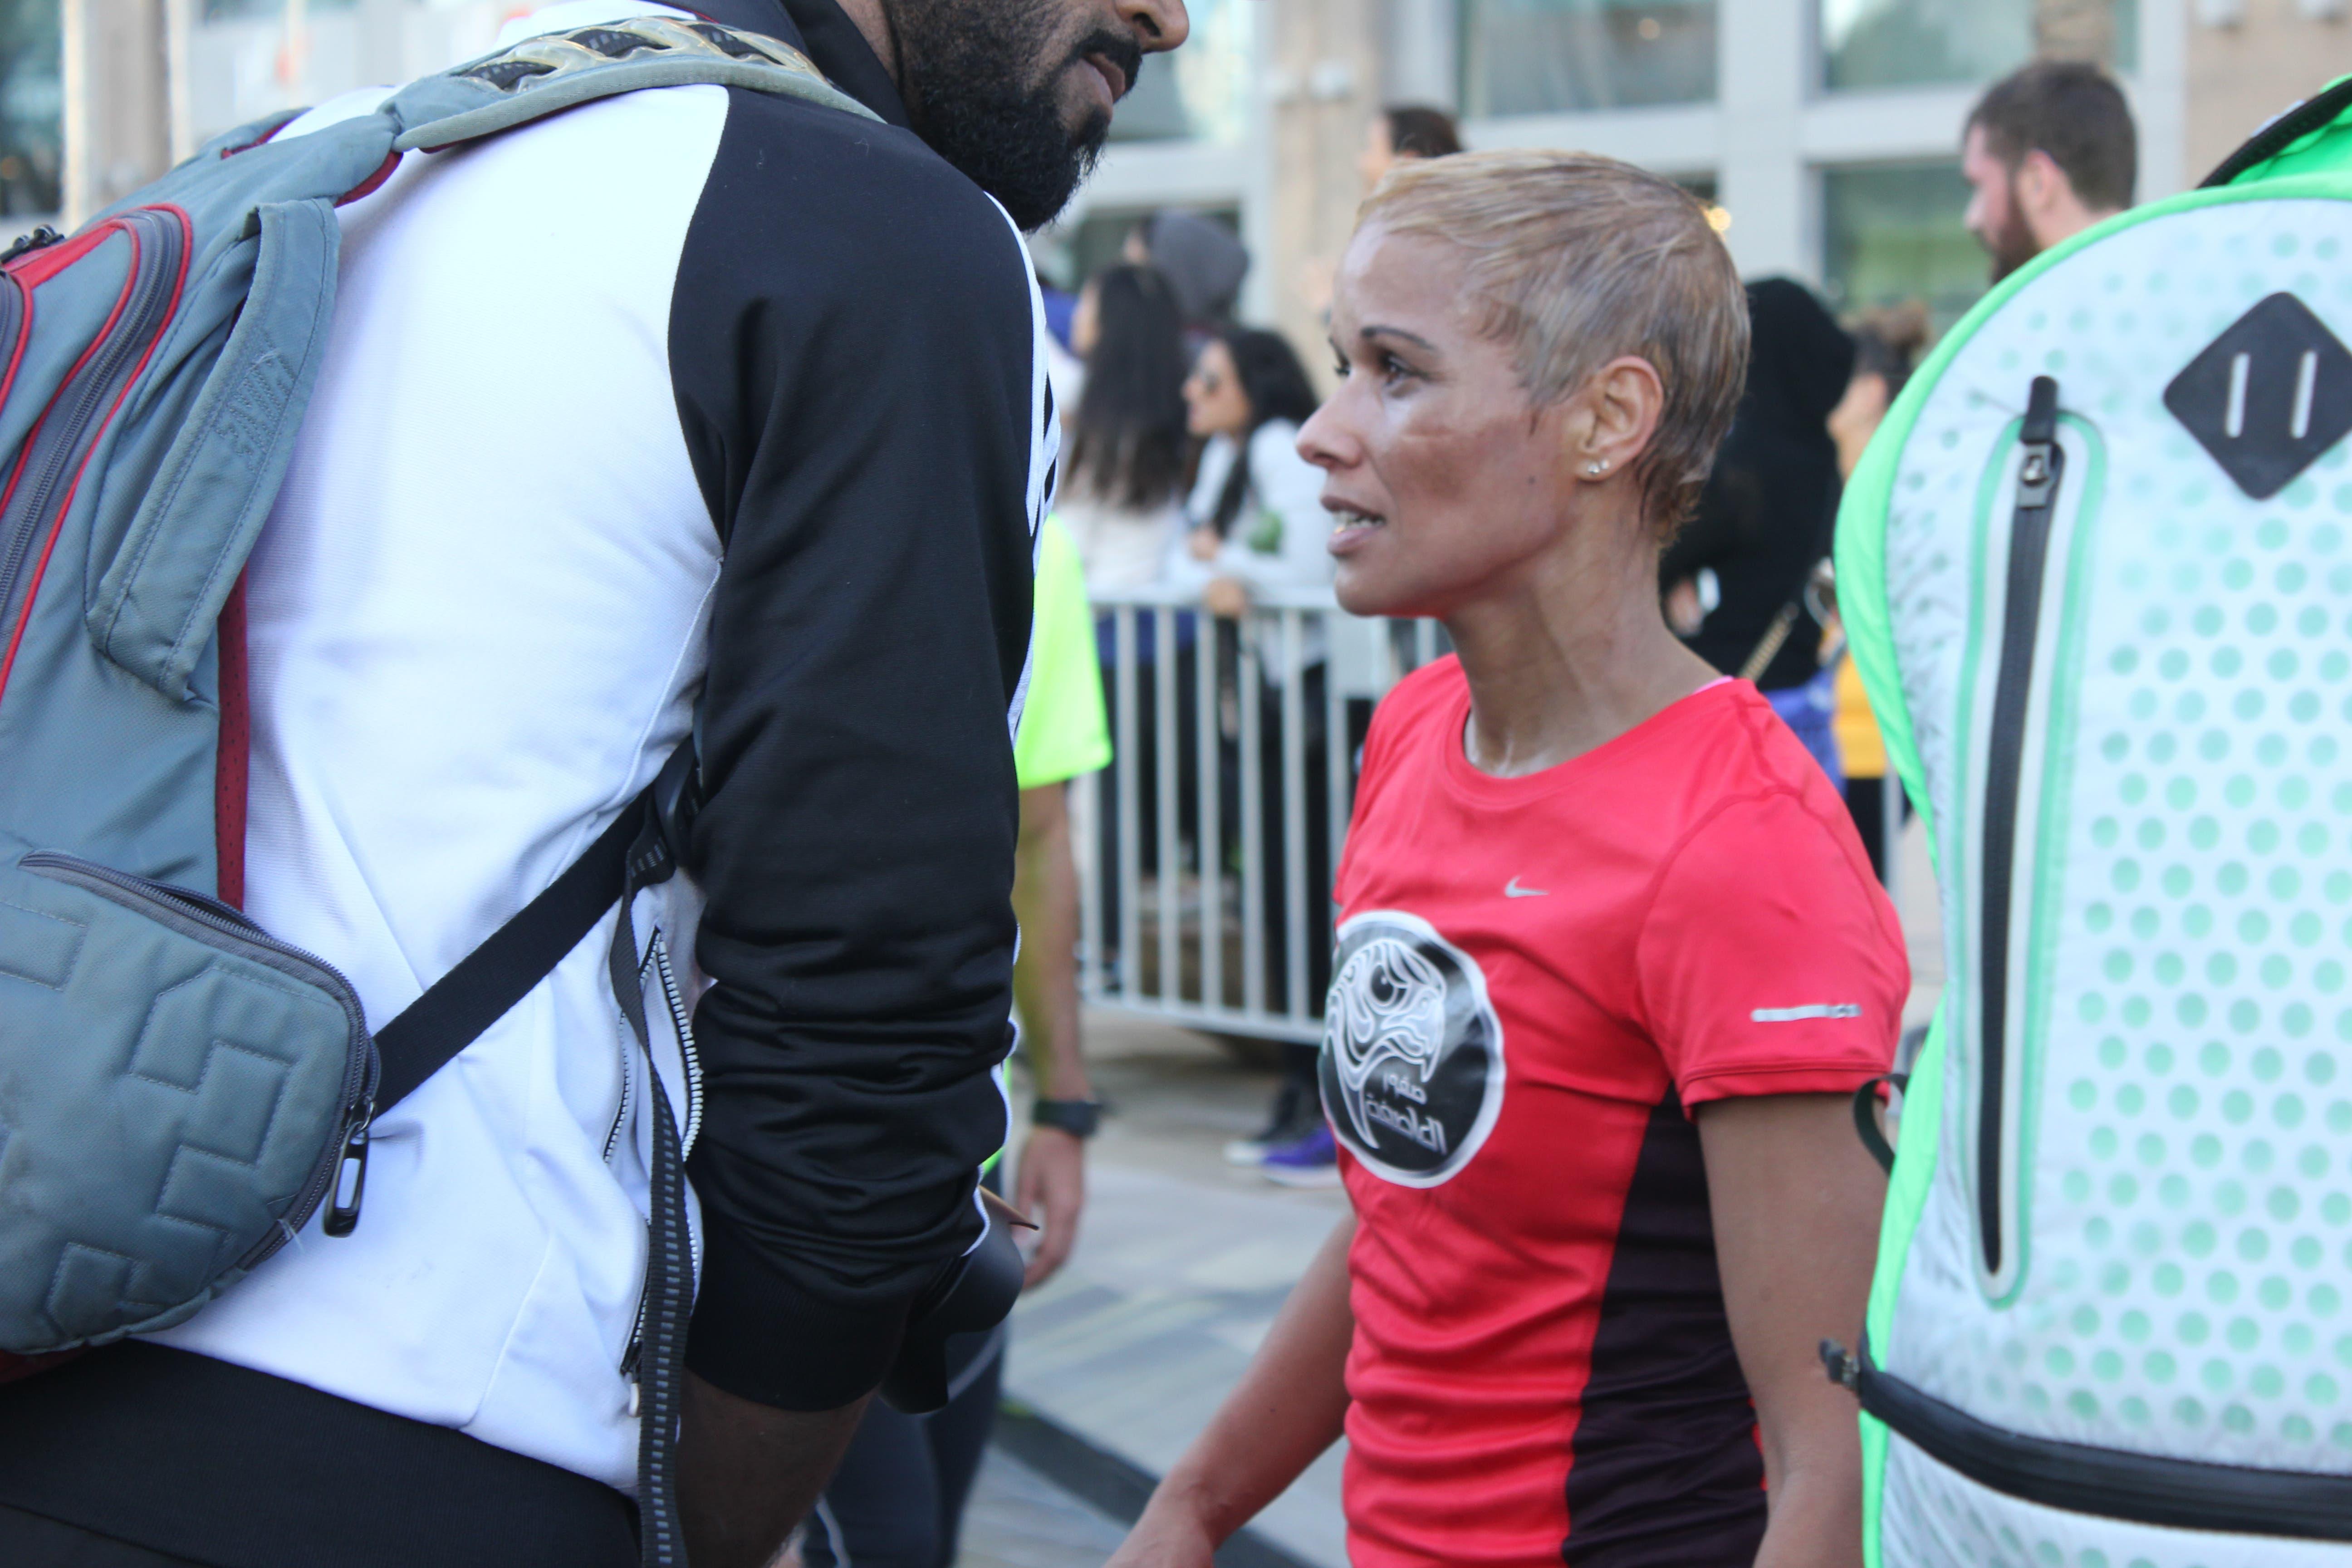 Latifa al Saroukh nike run photo: Al Arabiya News/ Salma El Shahed